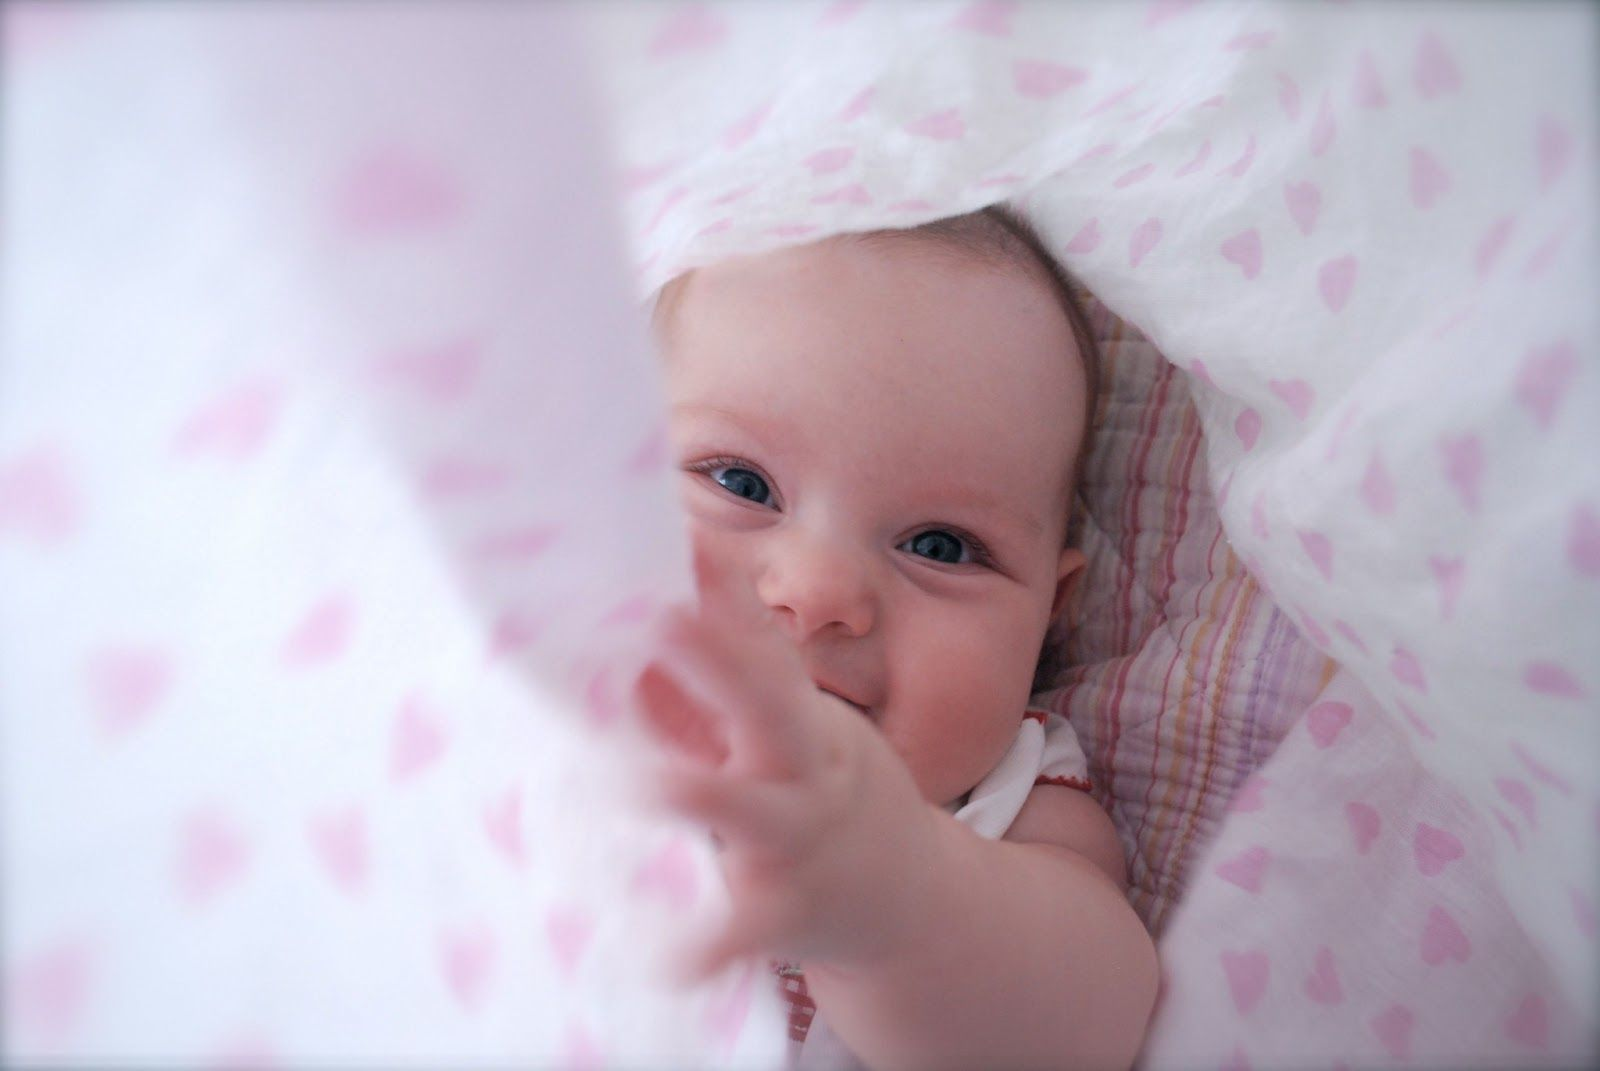 Cute Newborn Baby Boy Wallpaper Free Amazing Desktop Wallpapers HD